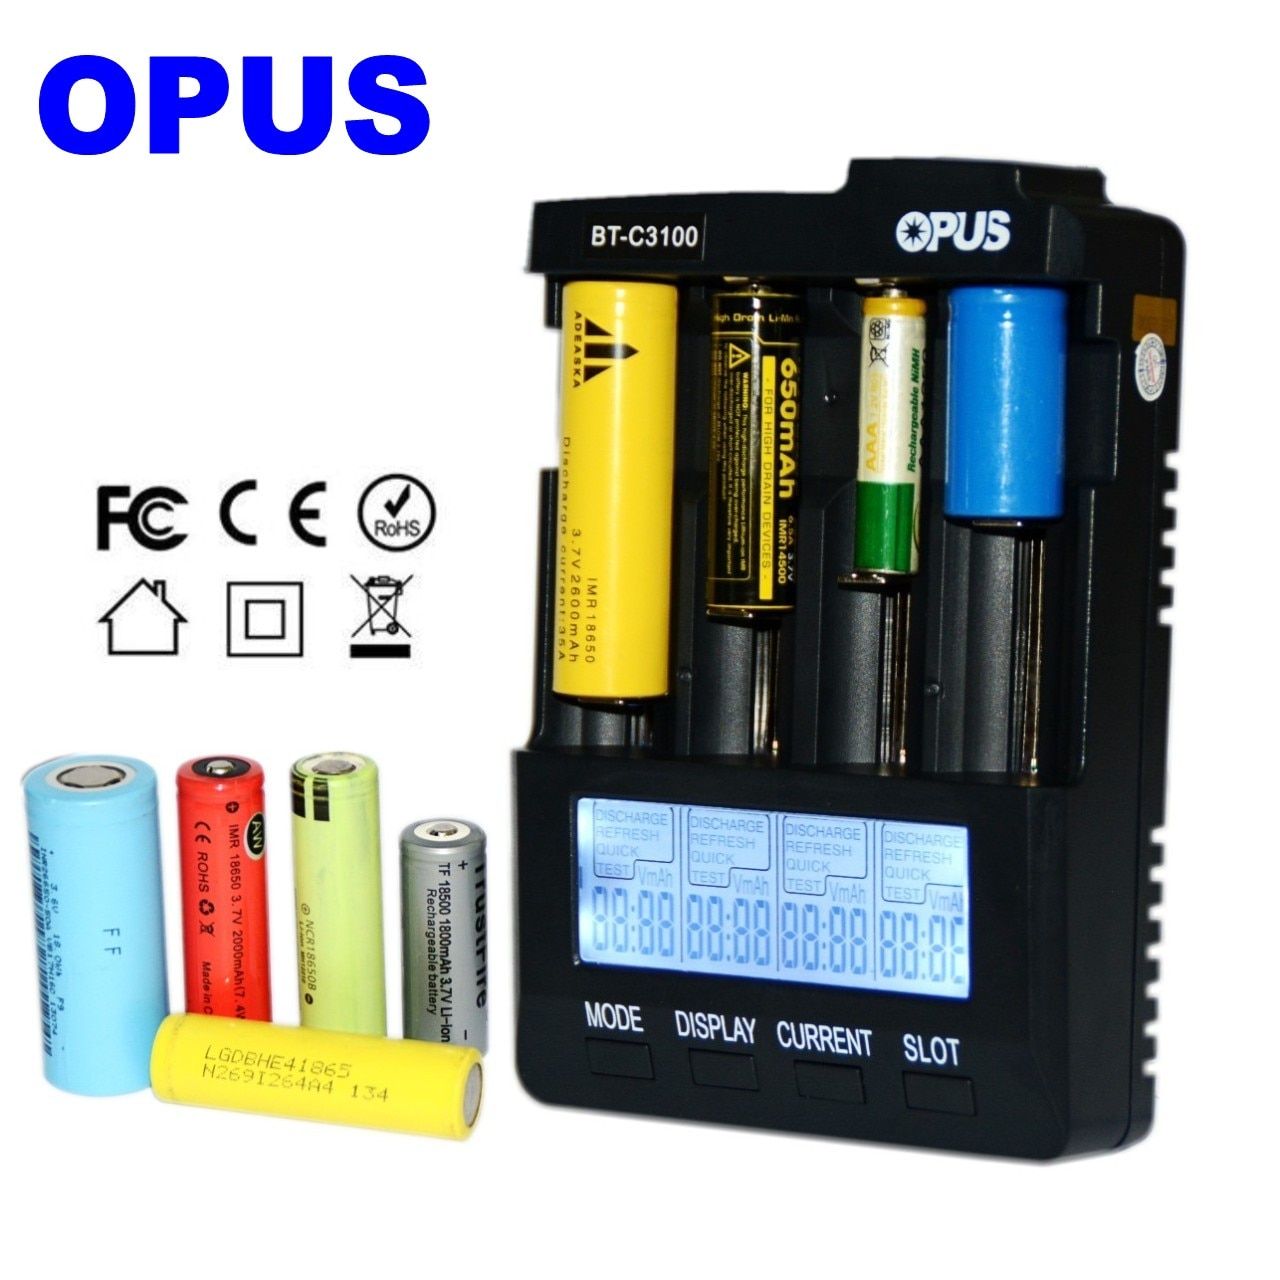 OPUS BT-C3100 Digital Intelligent 4 Slots LCD Battery Charger For Li-ion NiCd NiMH AA AAA 10440 1865